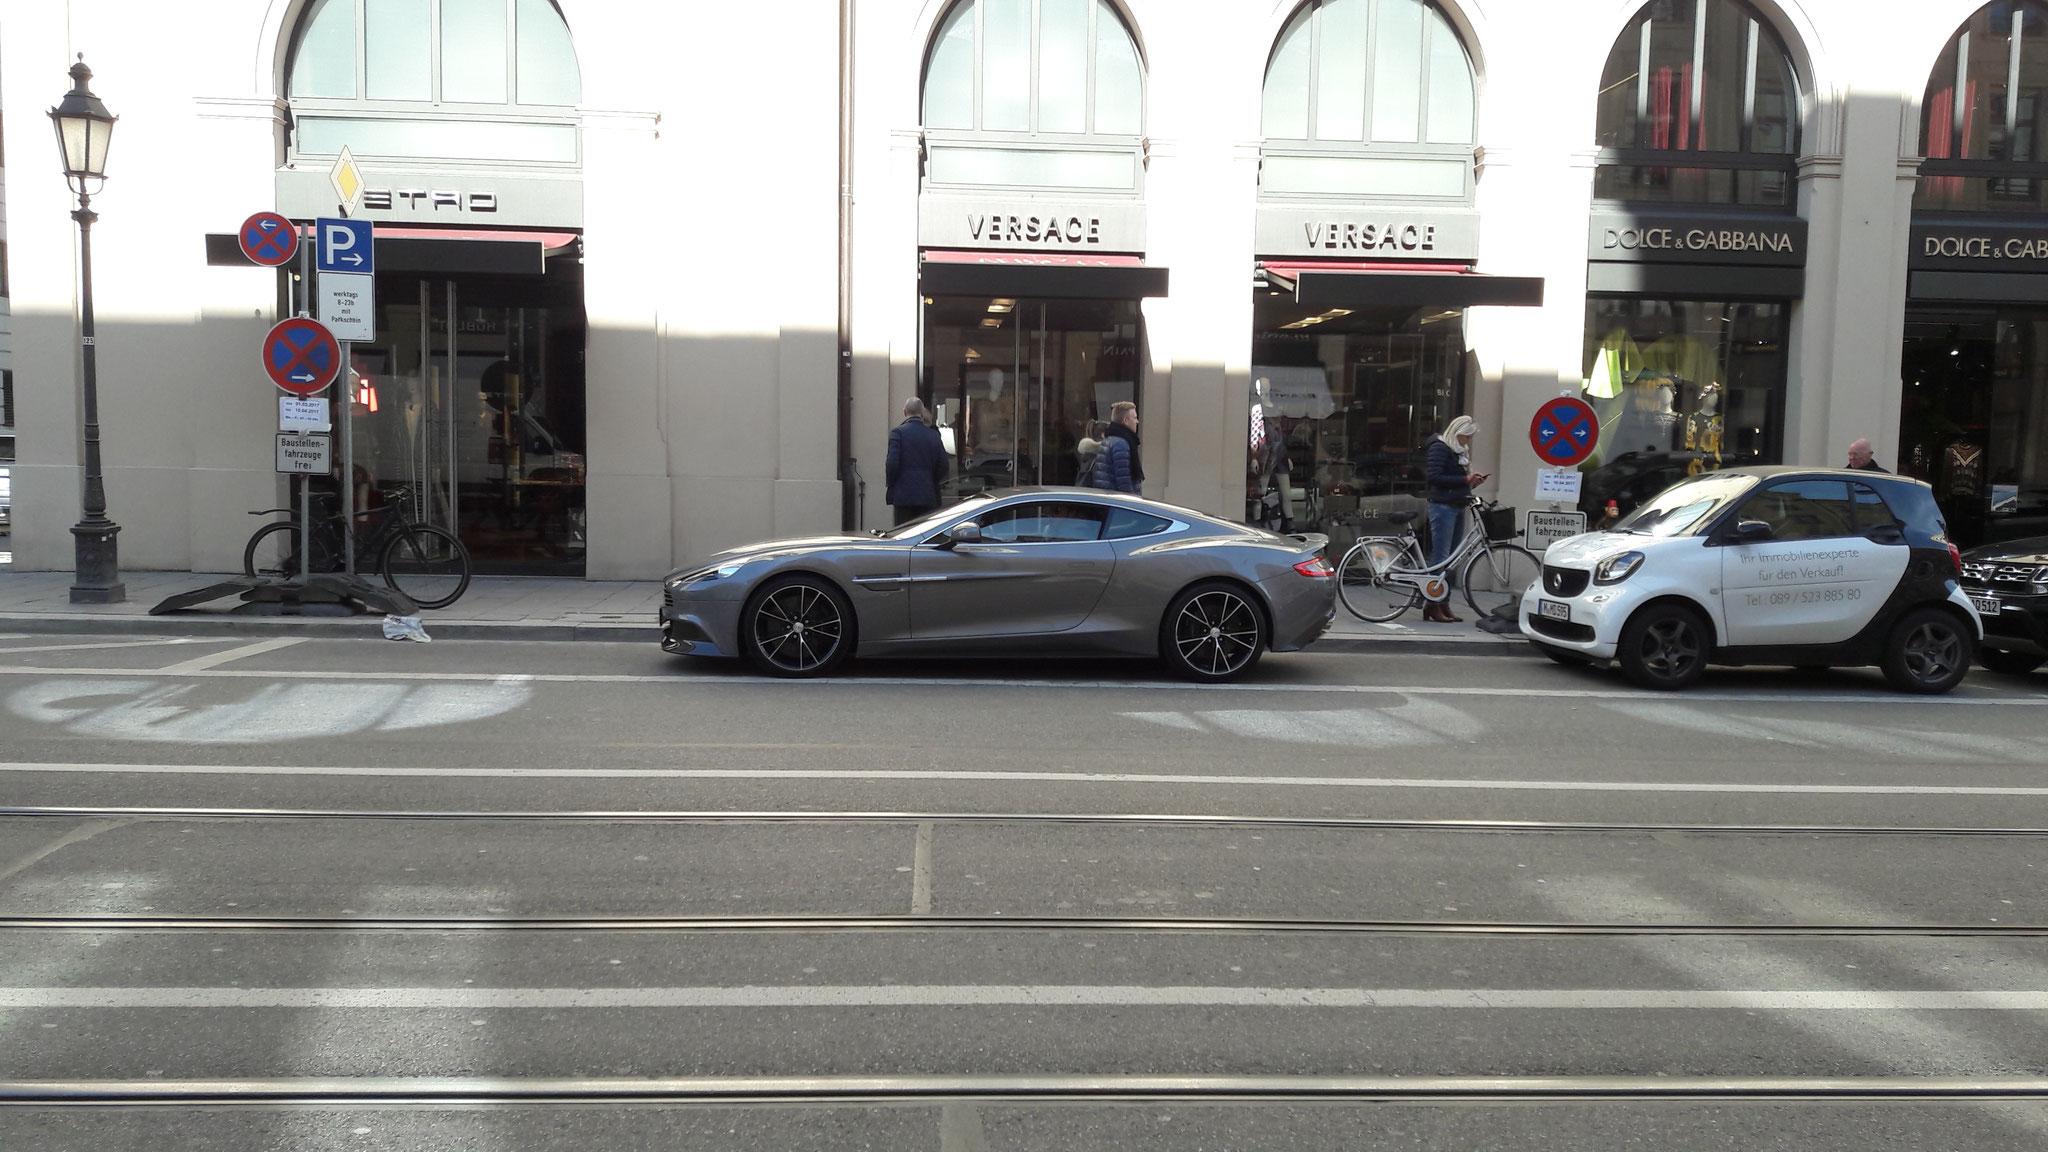 Aston Martin Vanquish - M-AM-8907